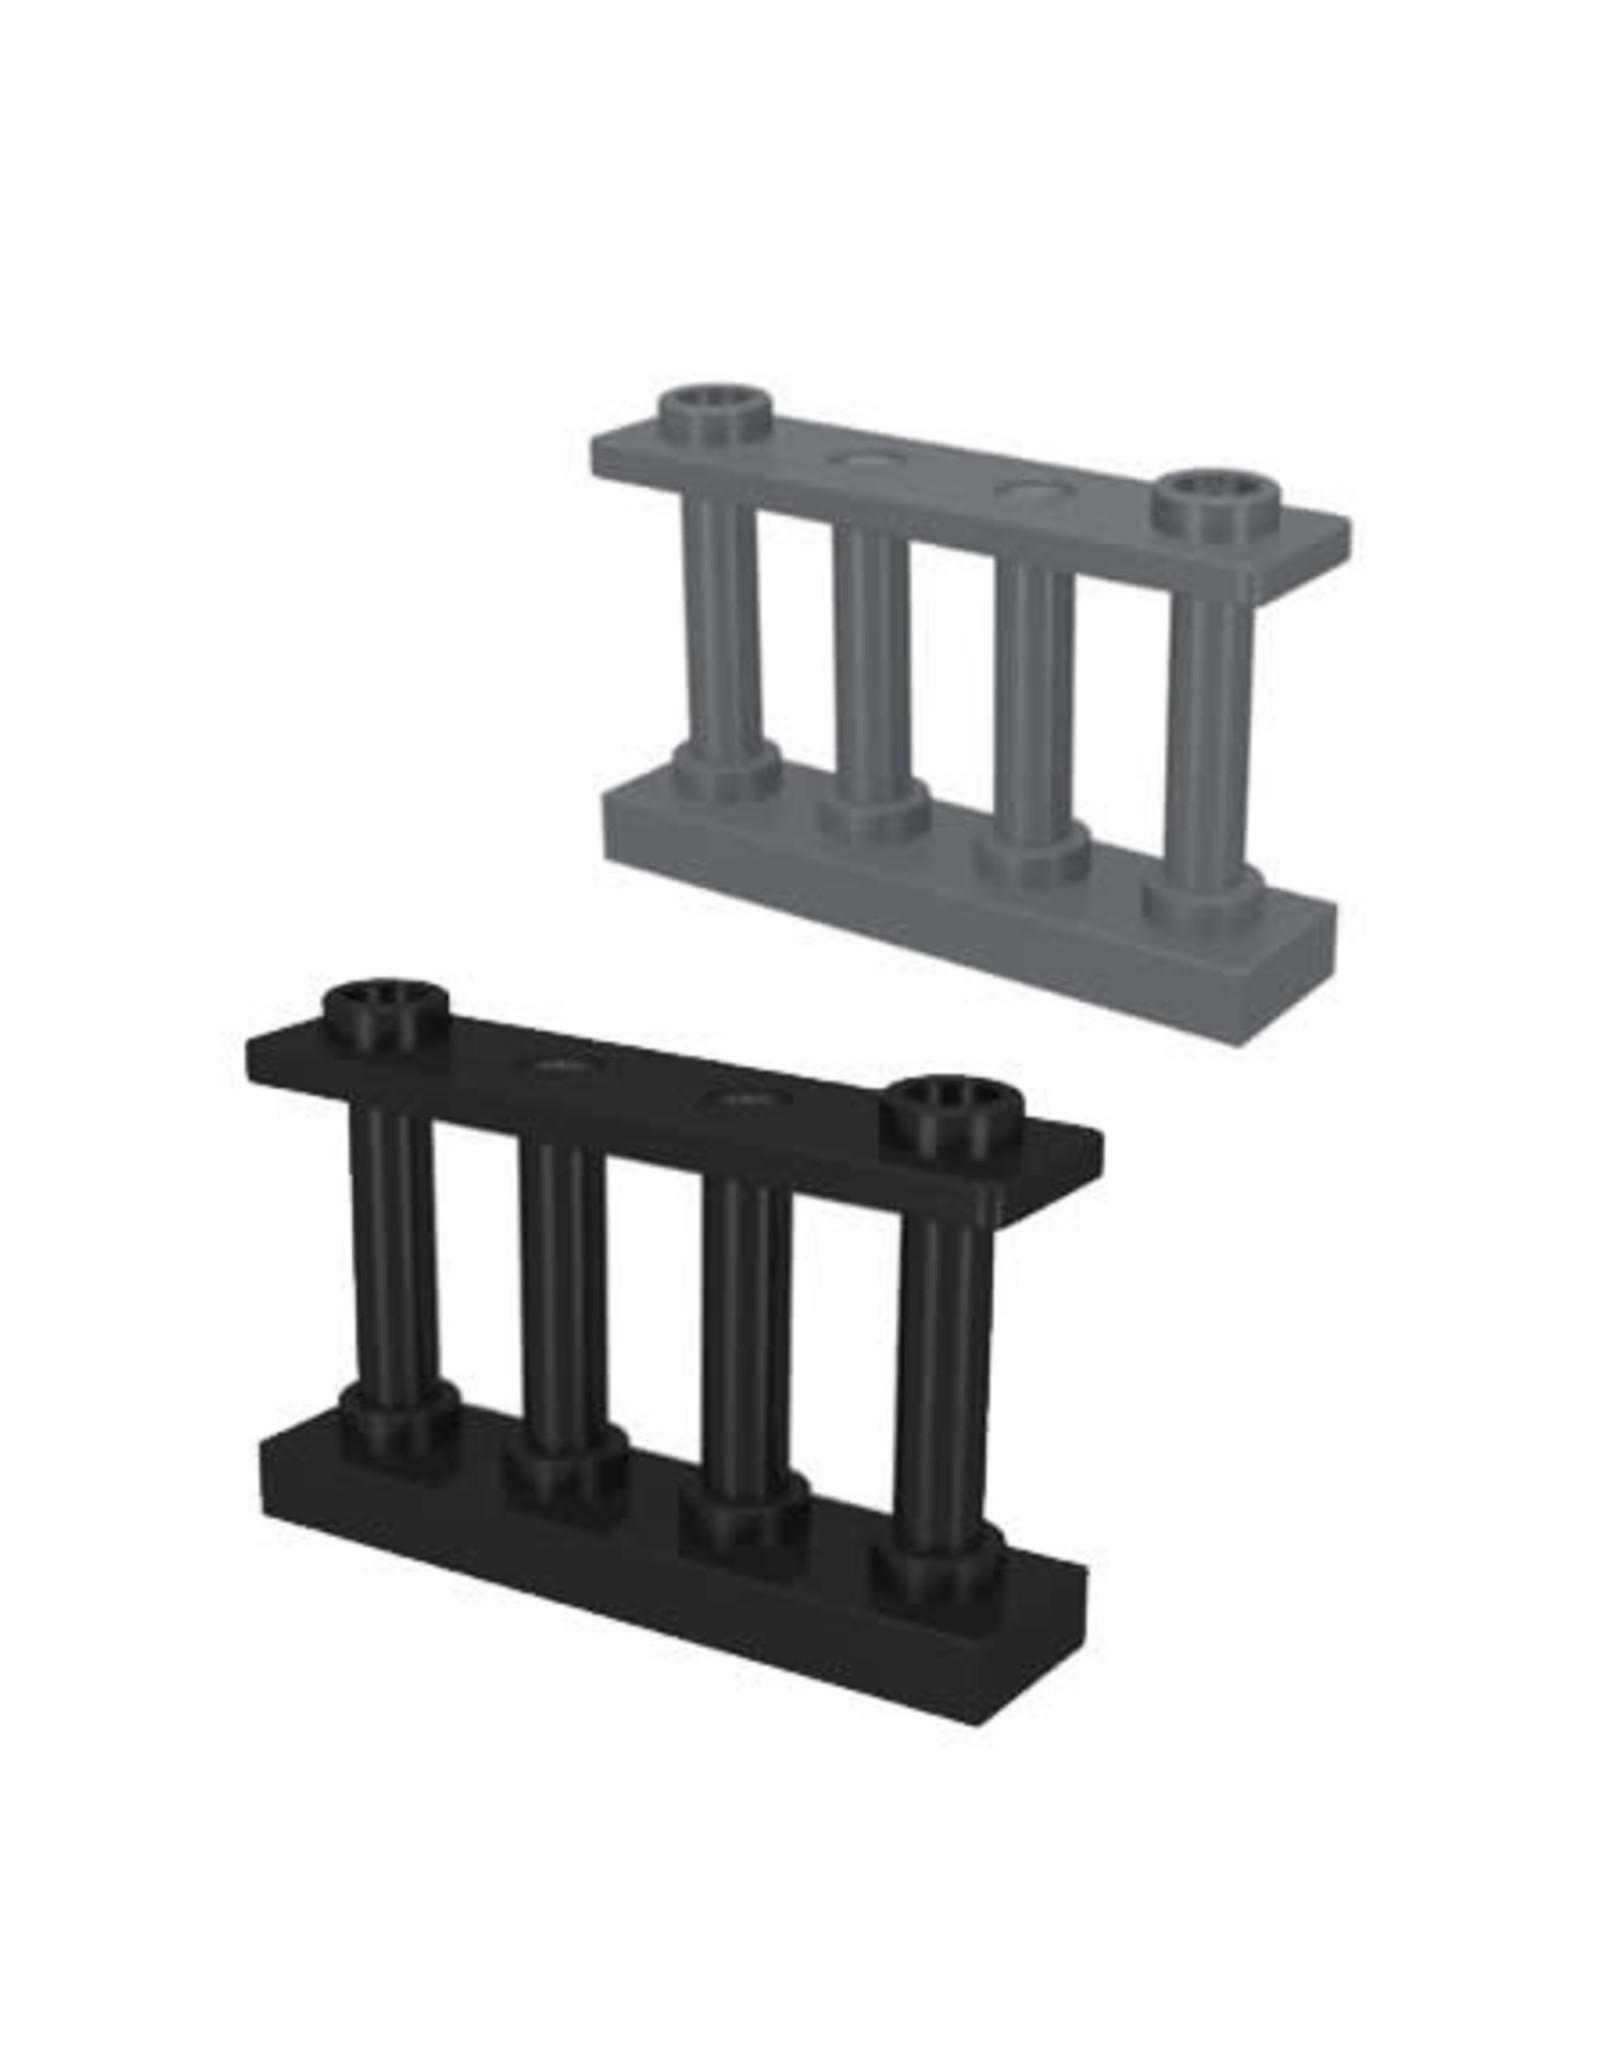 LEGO LEGO Hekjes 1 x 4 x 2 hoog 2 studs